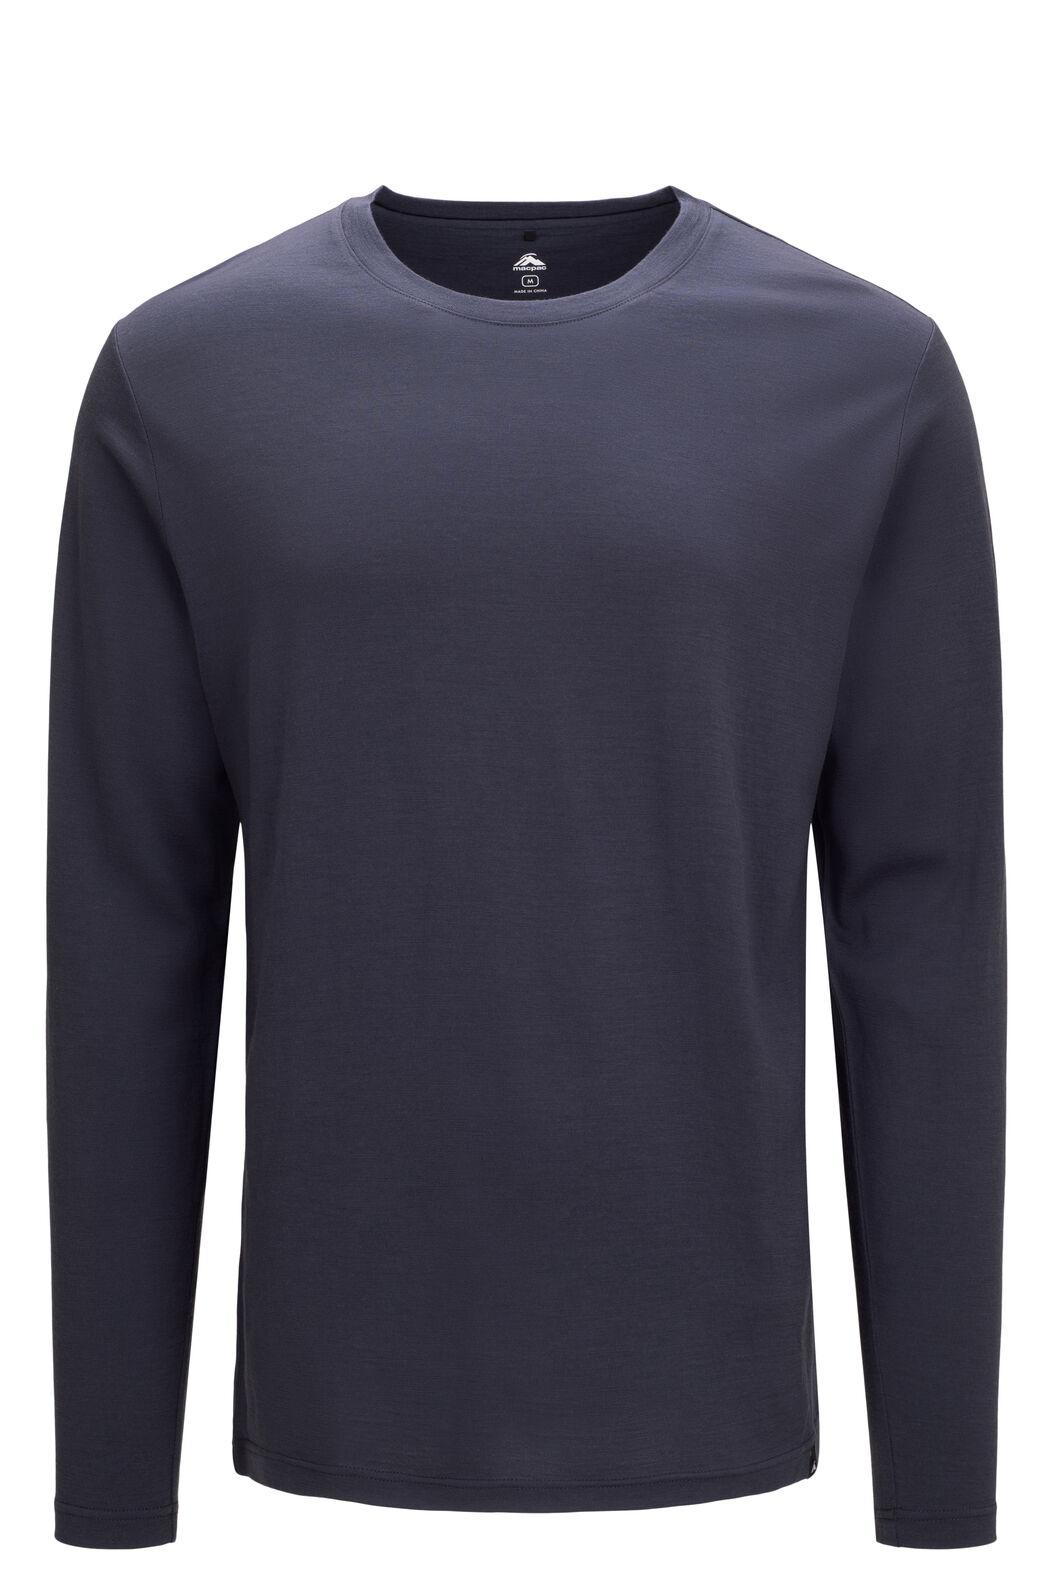 Macpac Men's Lyell 180 Merino Long Sleeve Tee, BLUE NIGHTS, hi-res